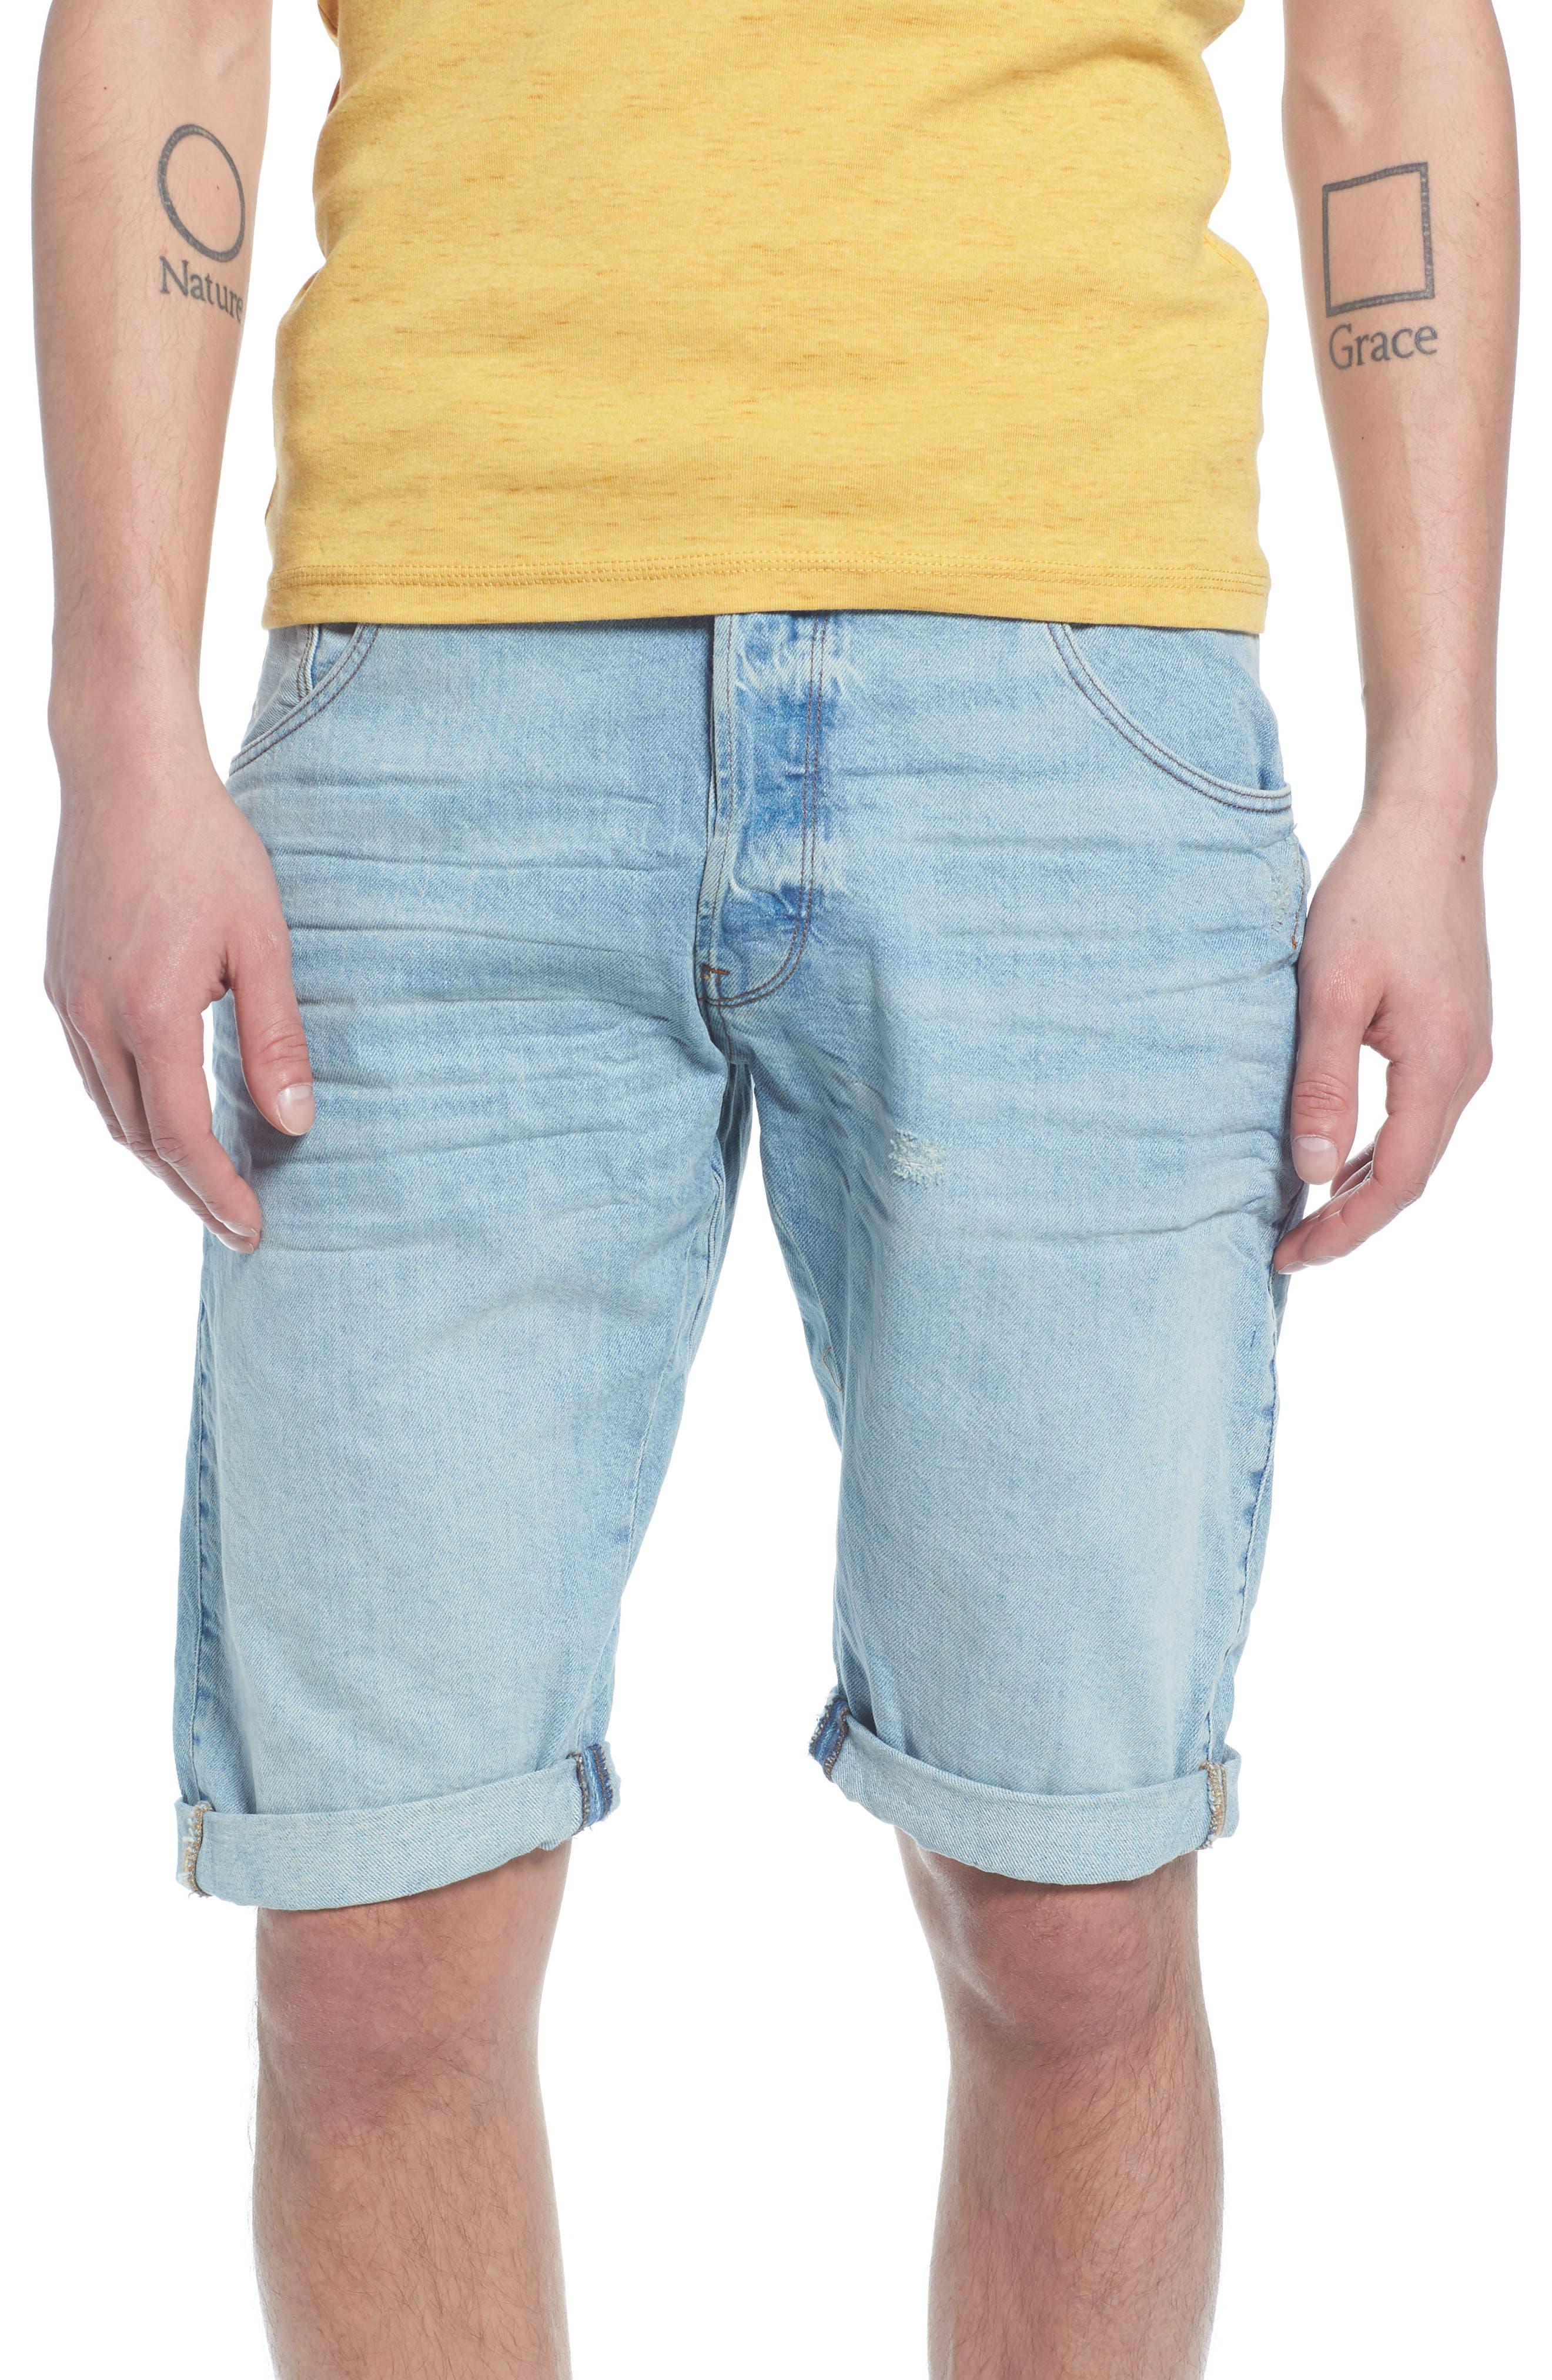 Arc 3D Shorts,                             Main thumbnail 1, color,                             Light Aged Blue